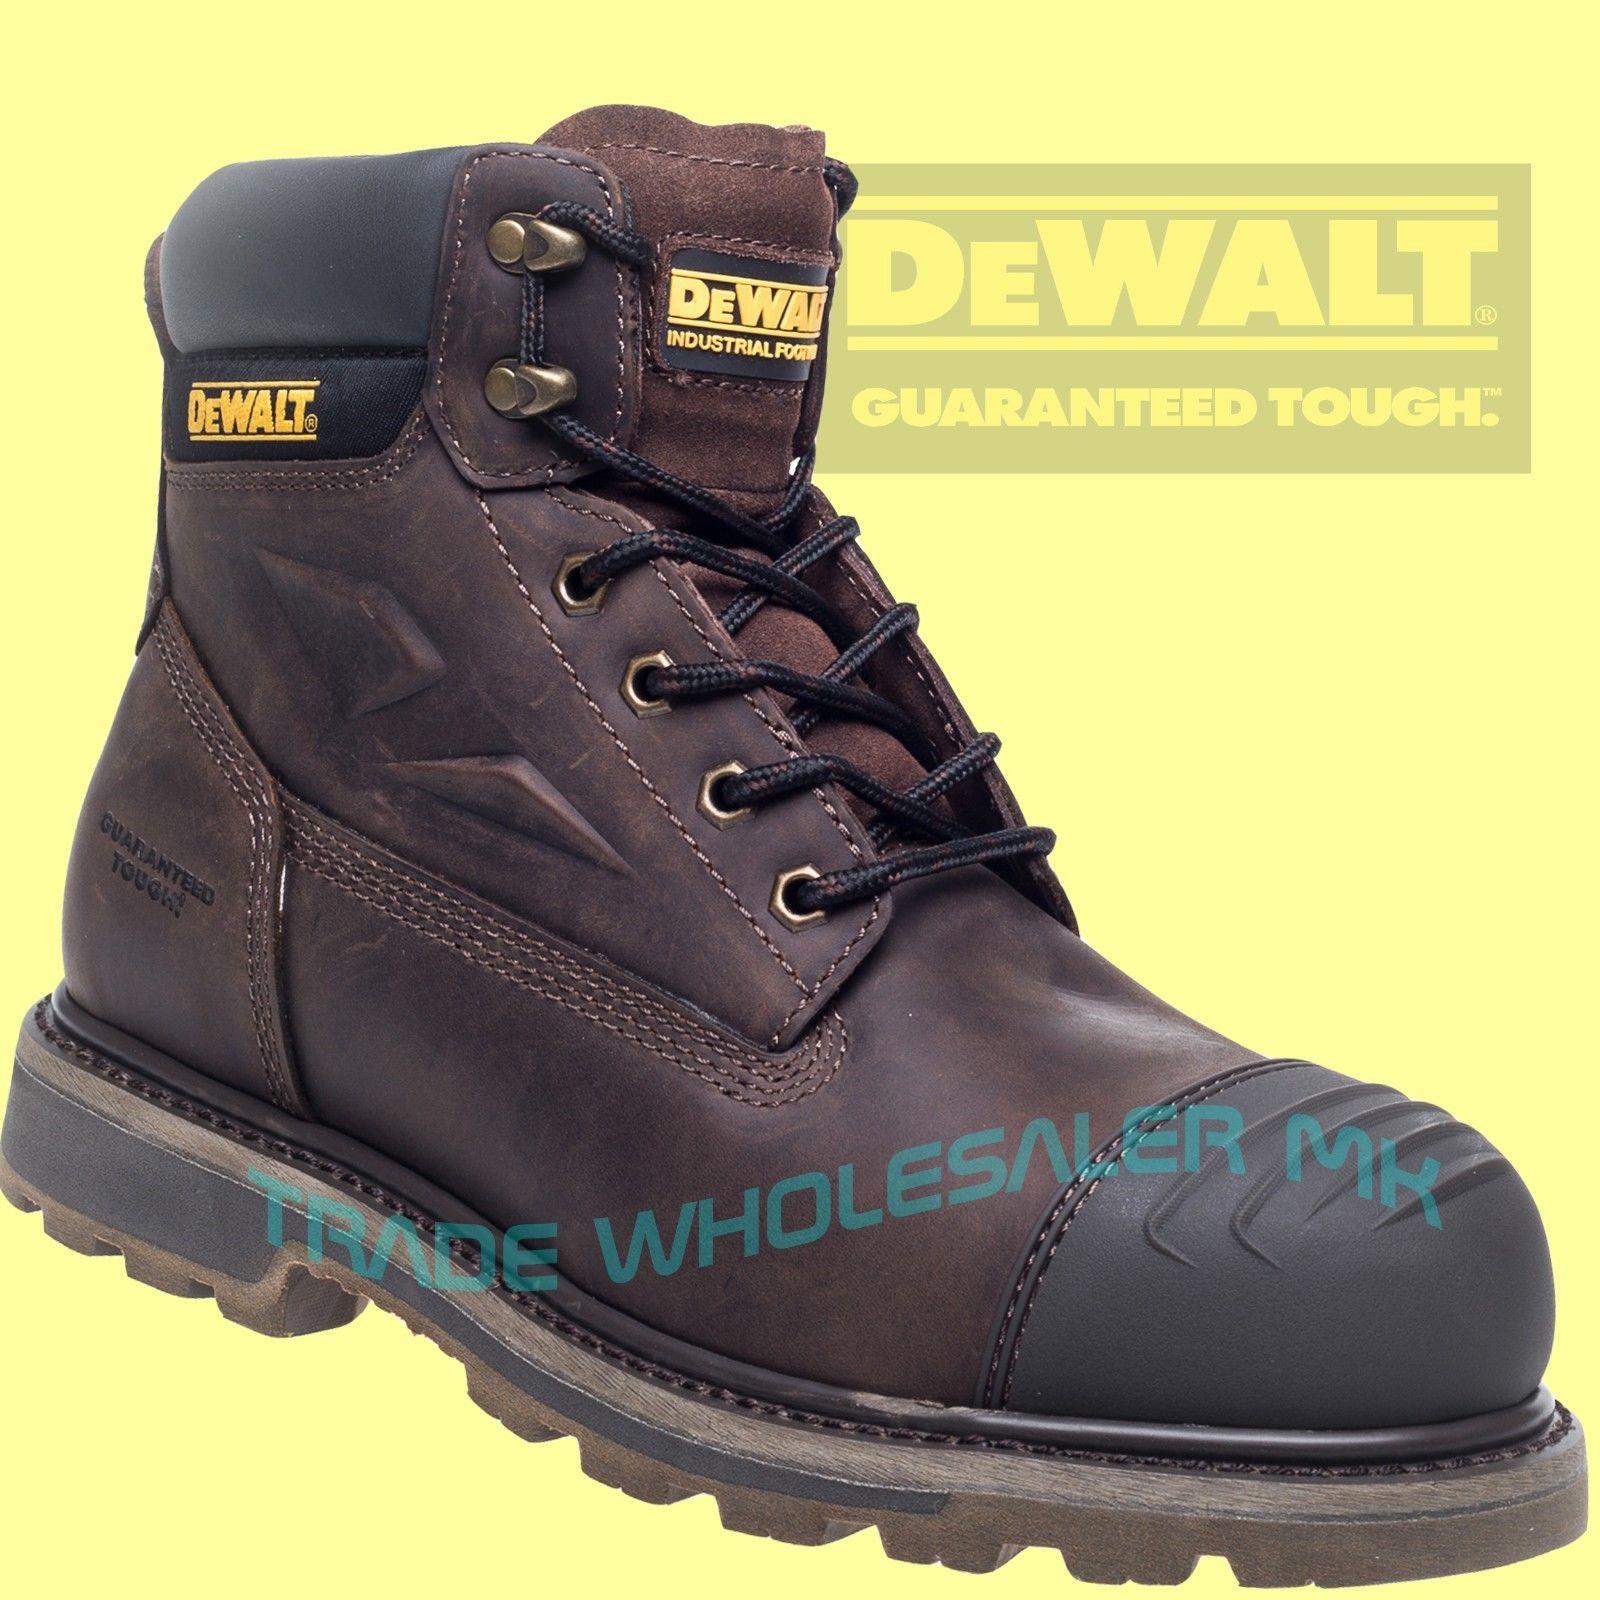 DeWalt Safety Boots Steel Toe Houston